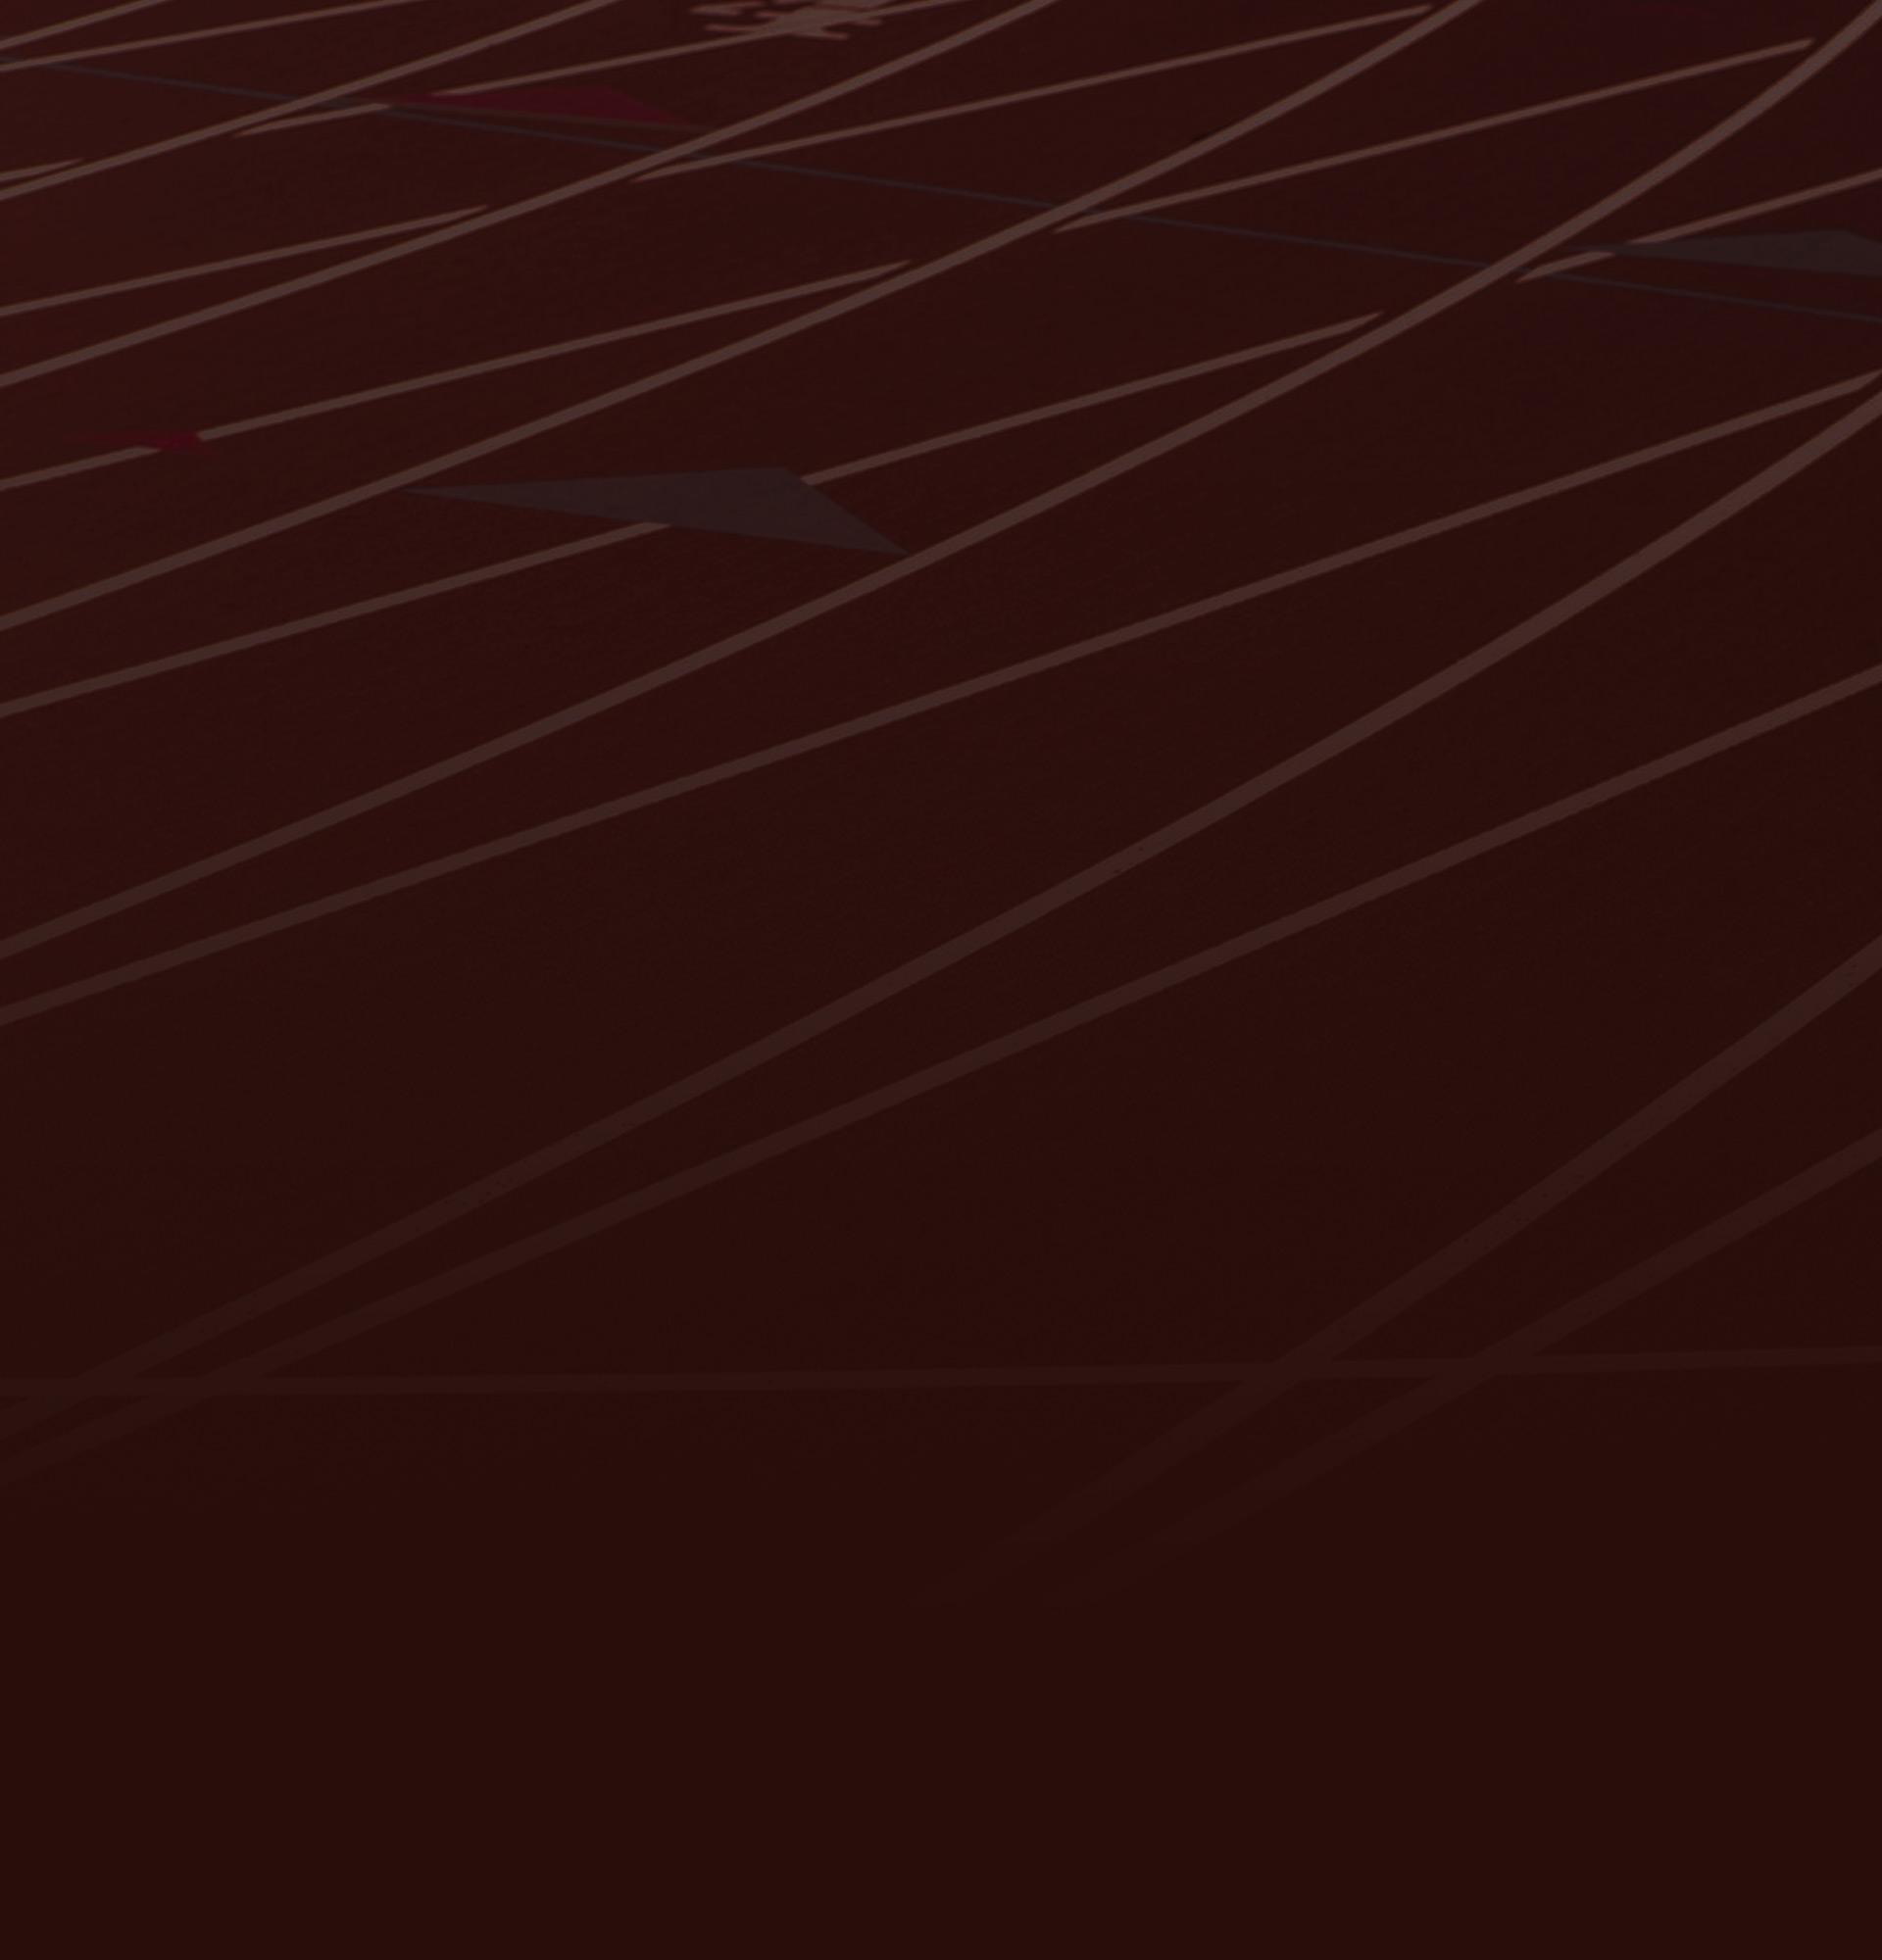 Lexus2020 SebCoeAlexHaydock Wilson Chapter1 7 1920x2000 BG